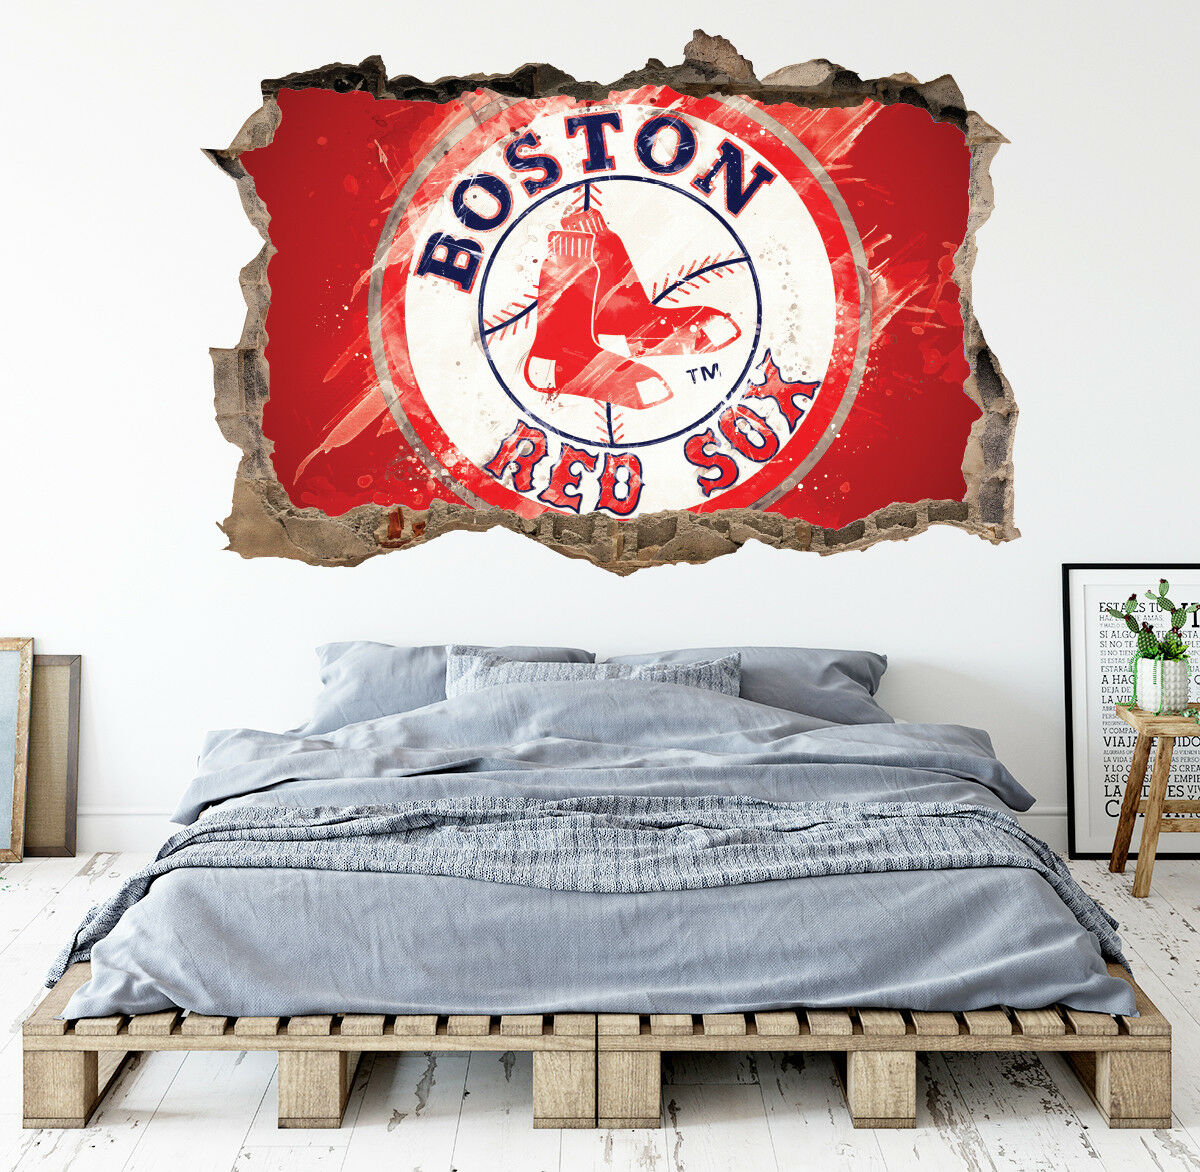 Boston Red Sox Wall Decor from i.ebayimg.com